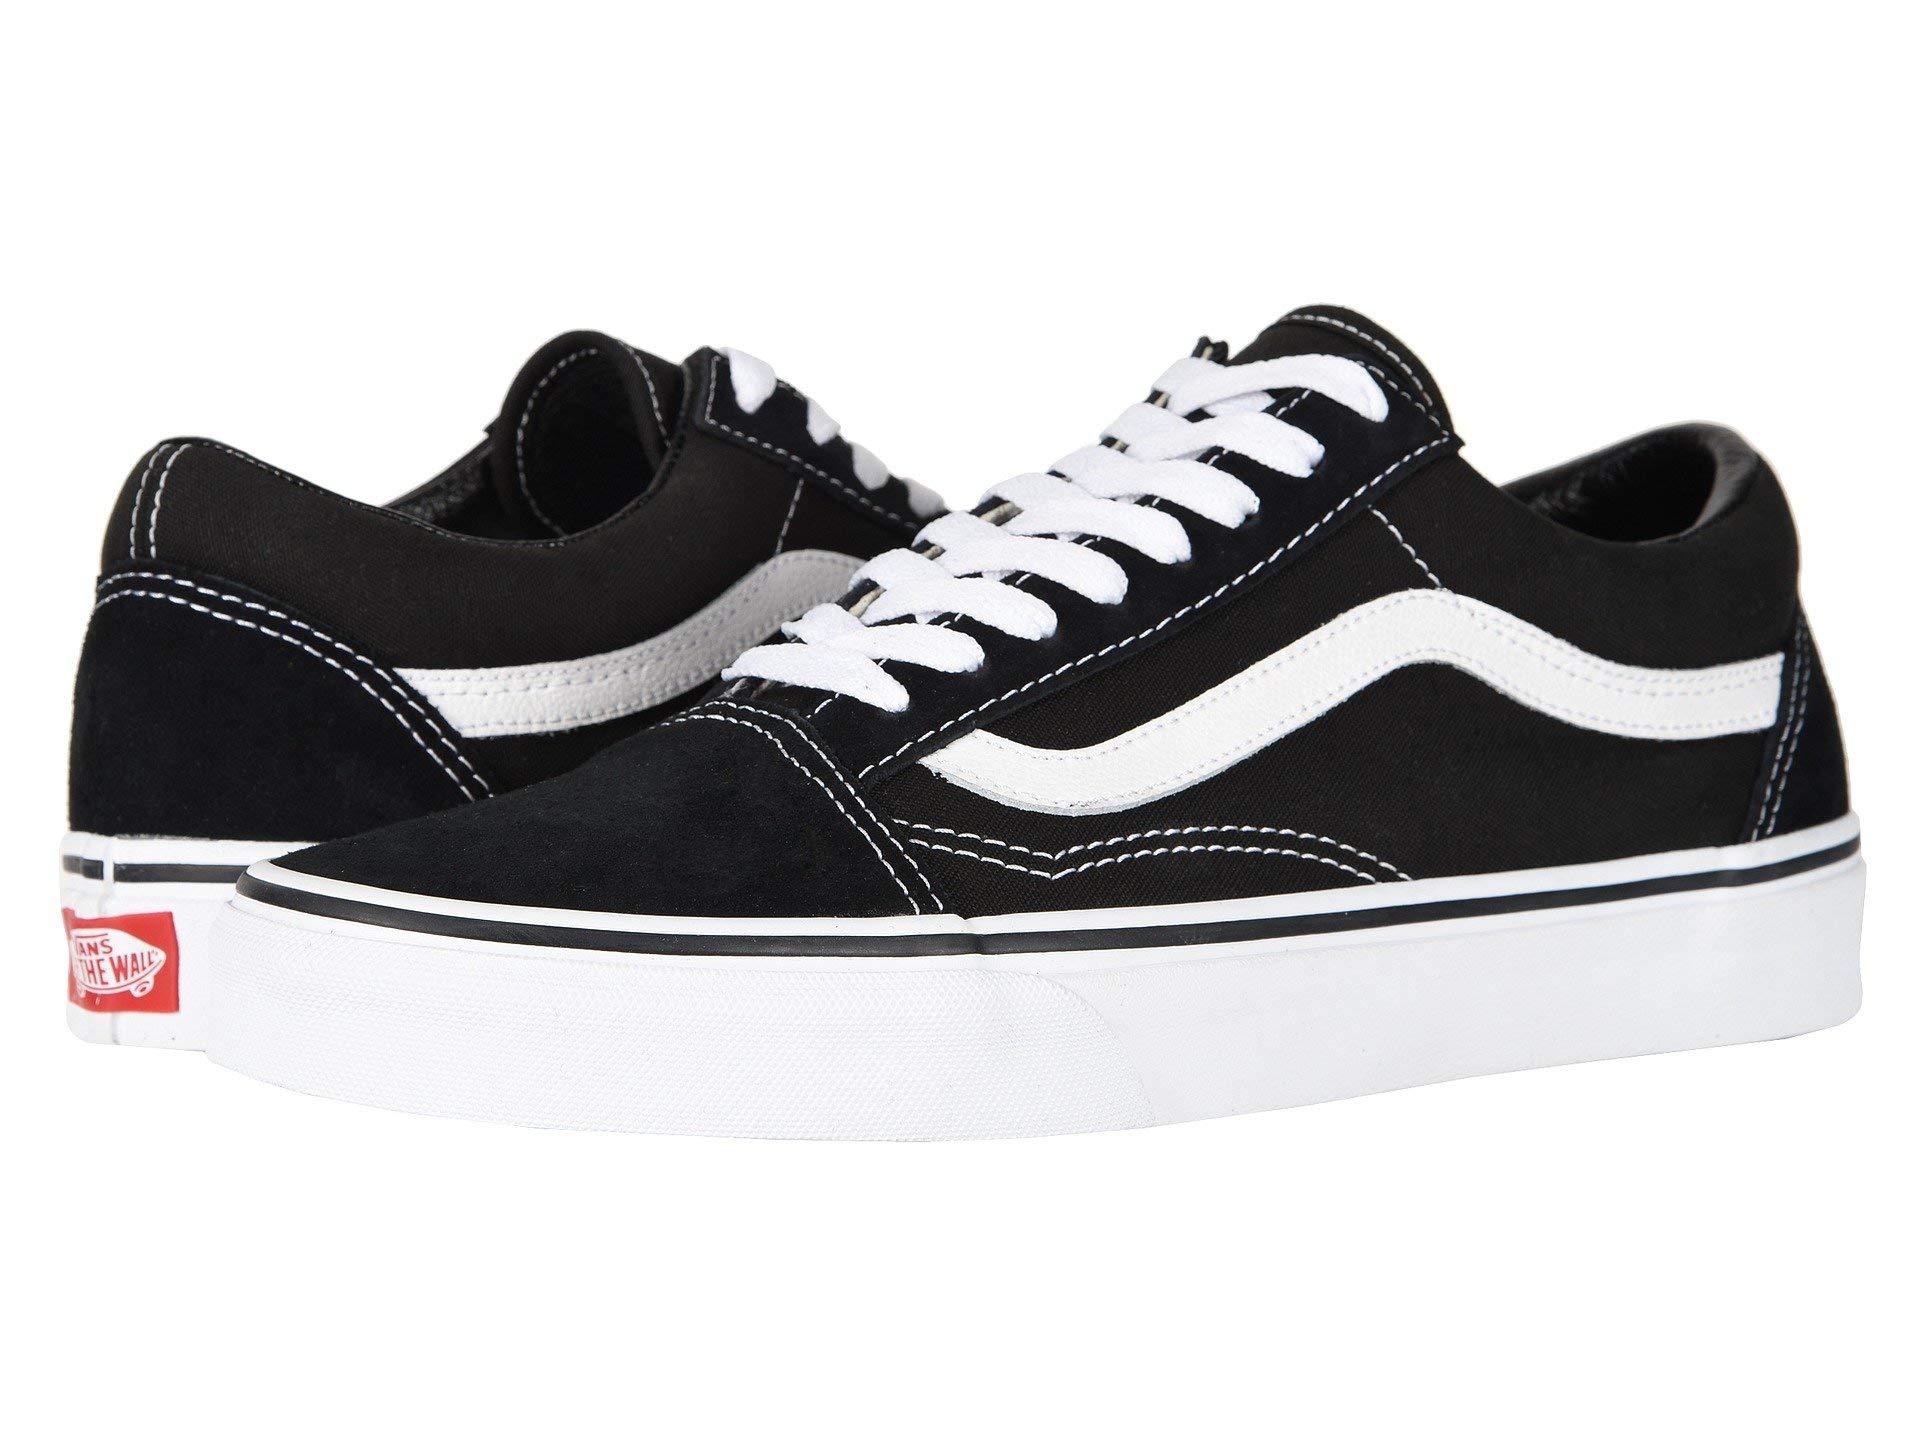 Vans Unisex Old Skool (Primary Check) Skate Shoe (5.5 M US Women / 4 M US Men, Black/White) by Vans (Image #1)